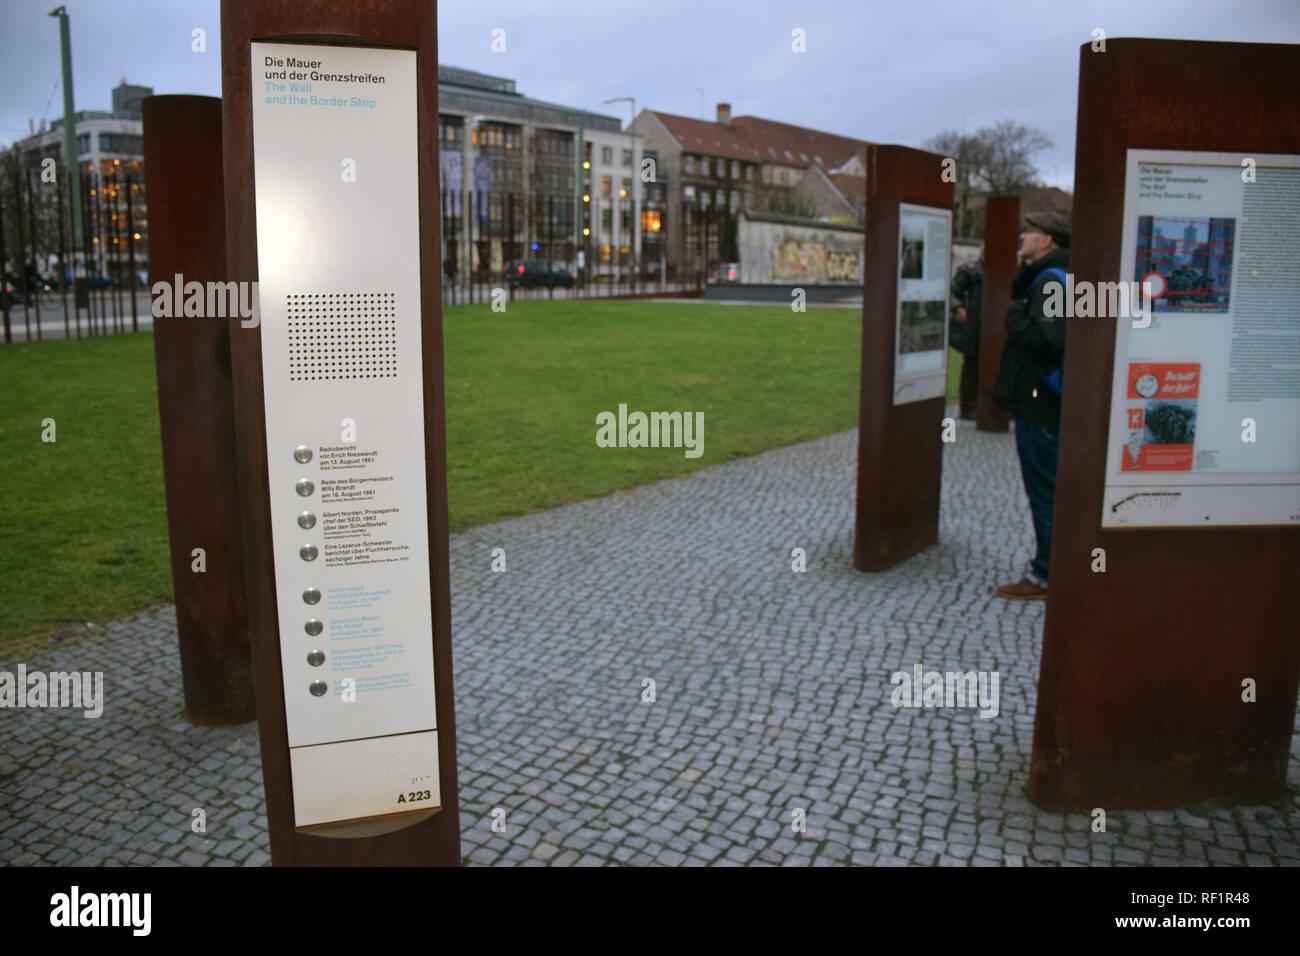 Bernauer Stasse, Berlin, 1.4km stretch of original Wall. Germany January 2019 - Stock Image